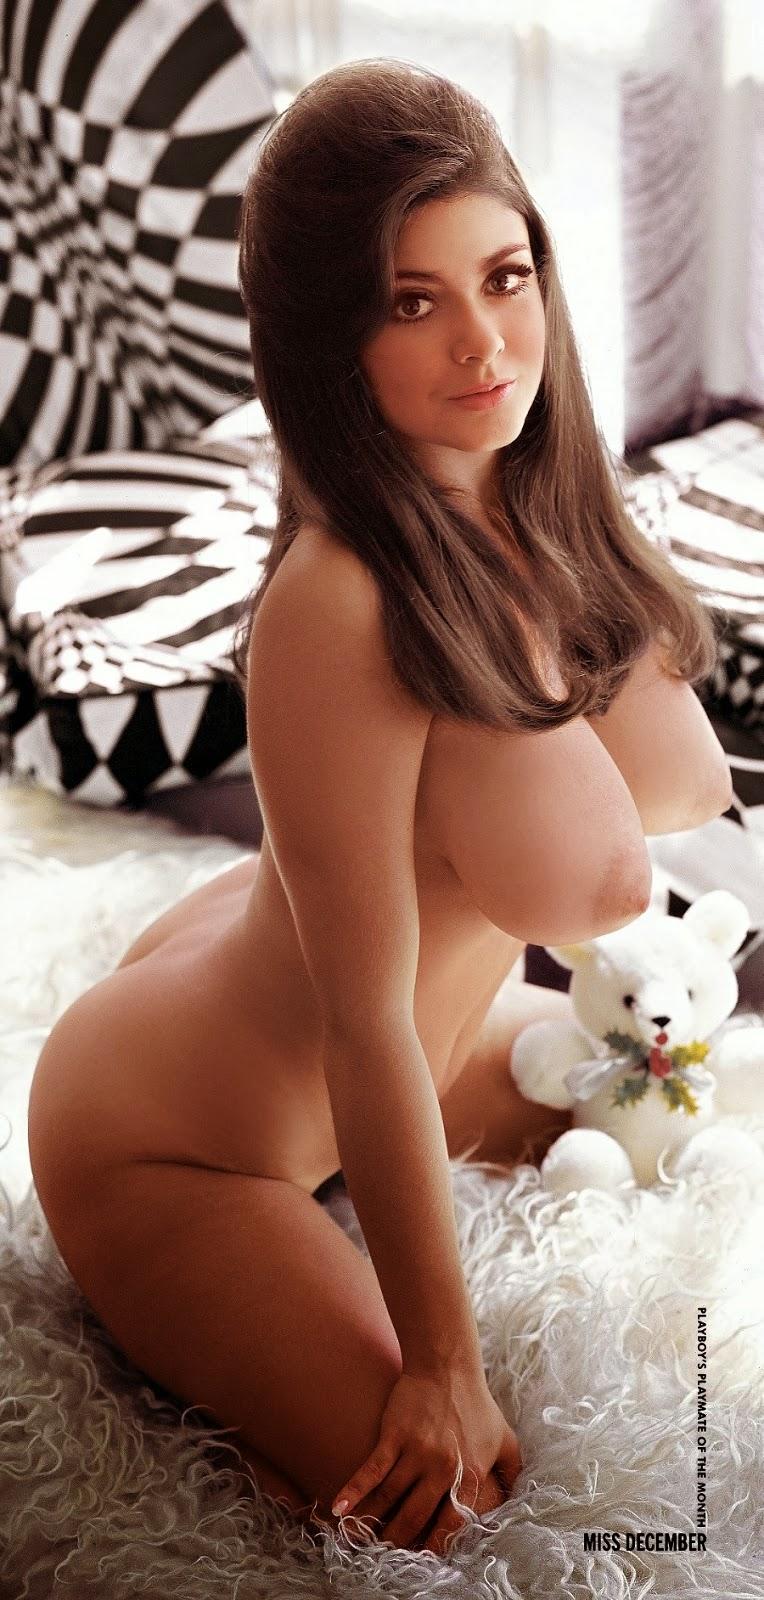 Cyntia buell bull nude